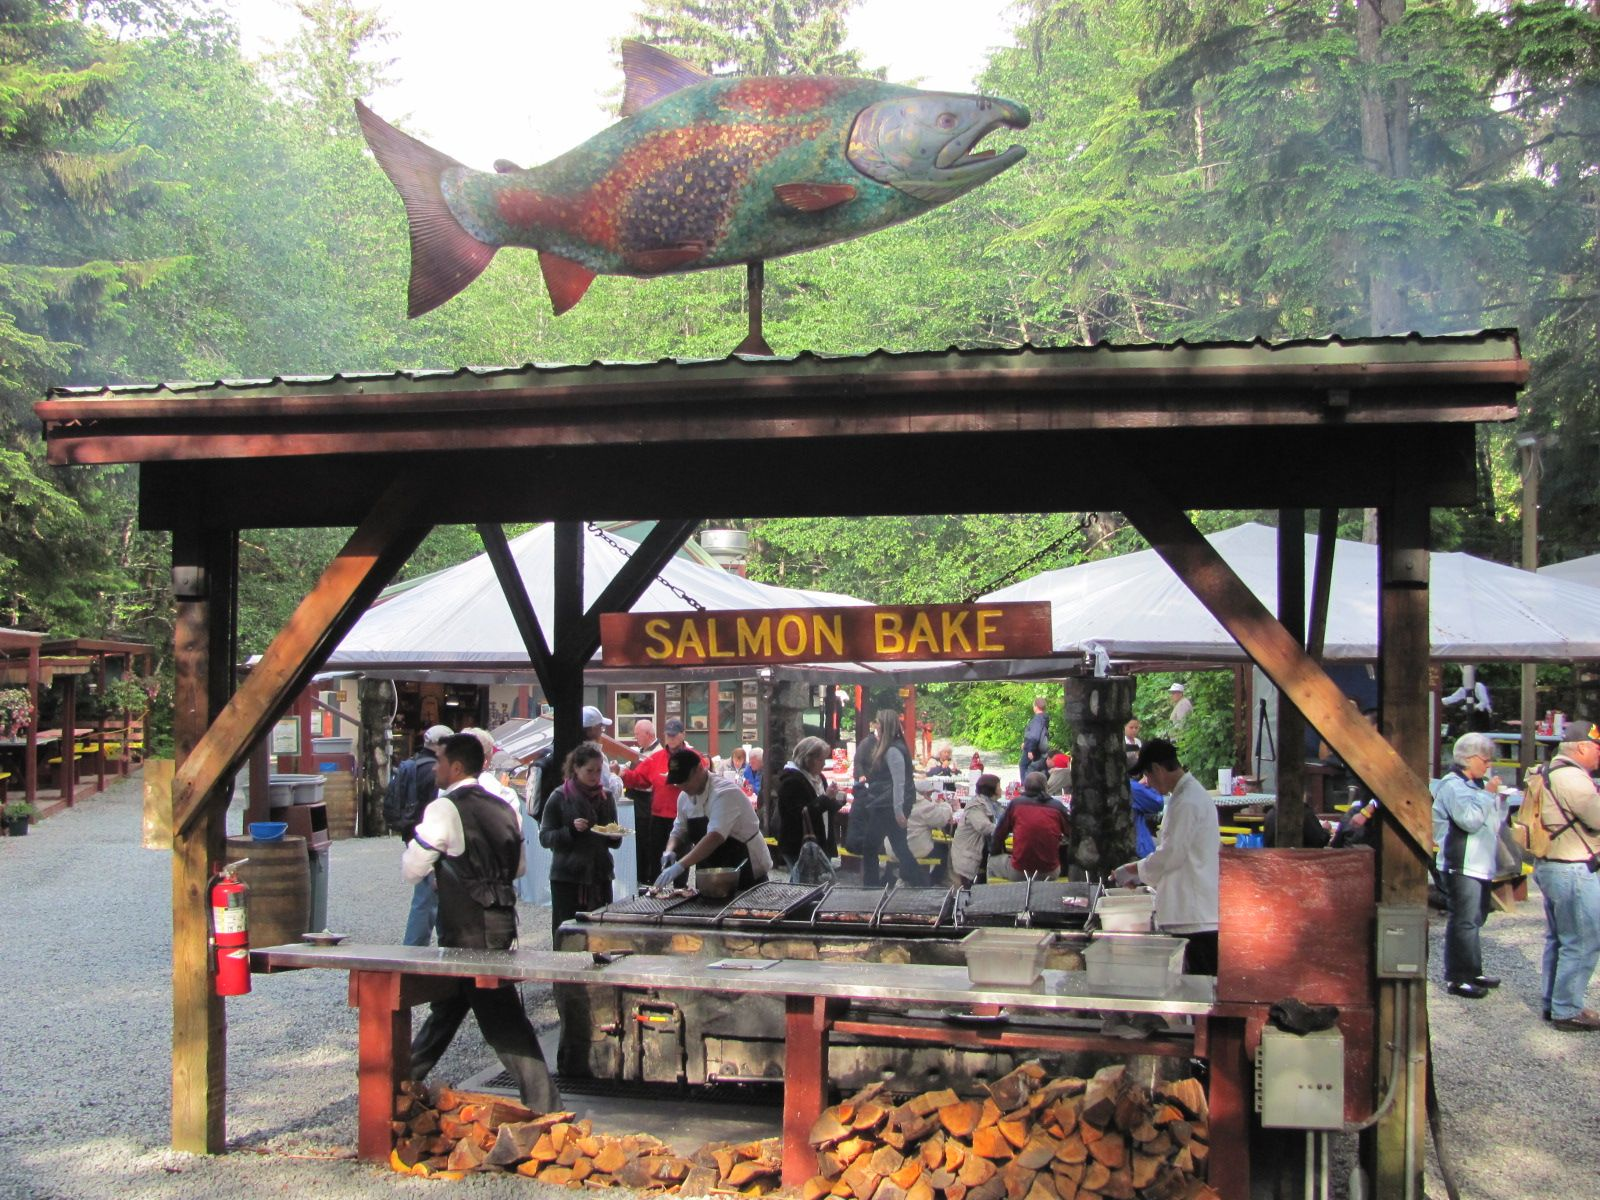 Alaskan Salmon Bake Immerse Yourself In An Allinclusive Alaskan - Alaska all inclusive